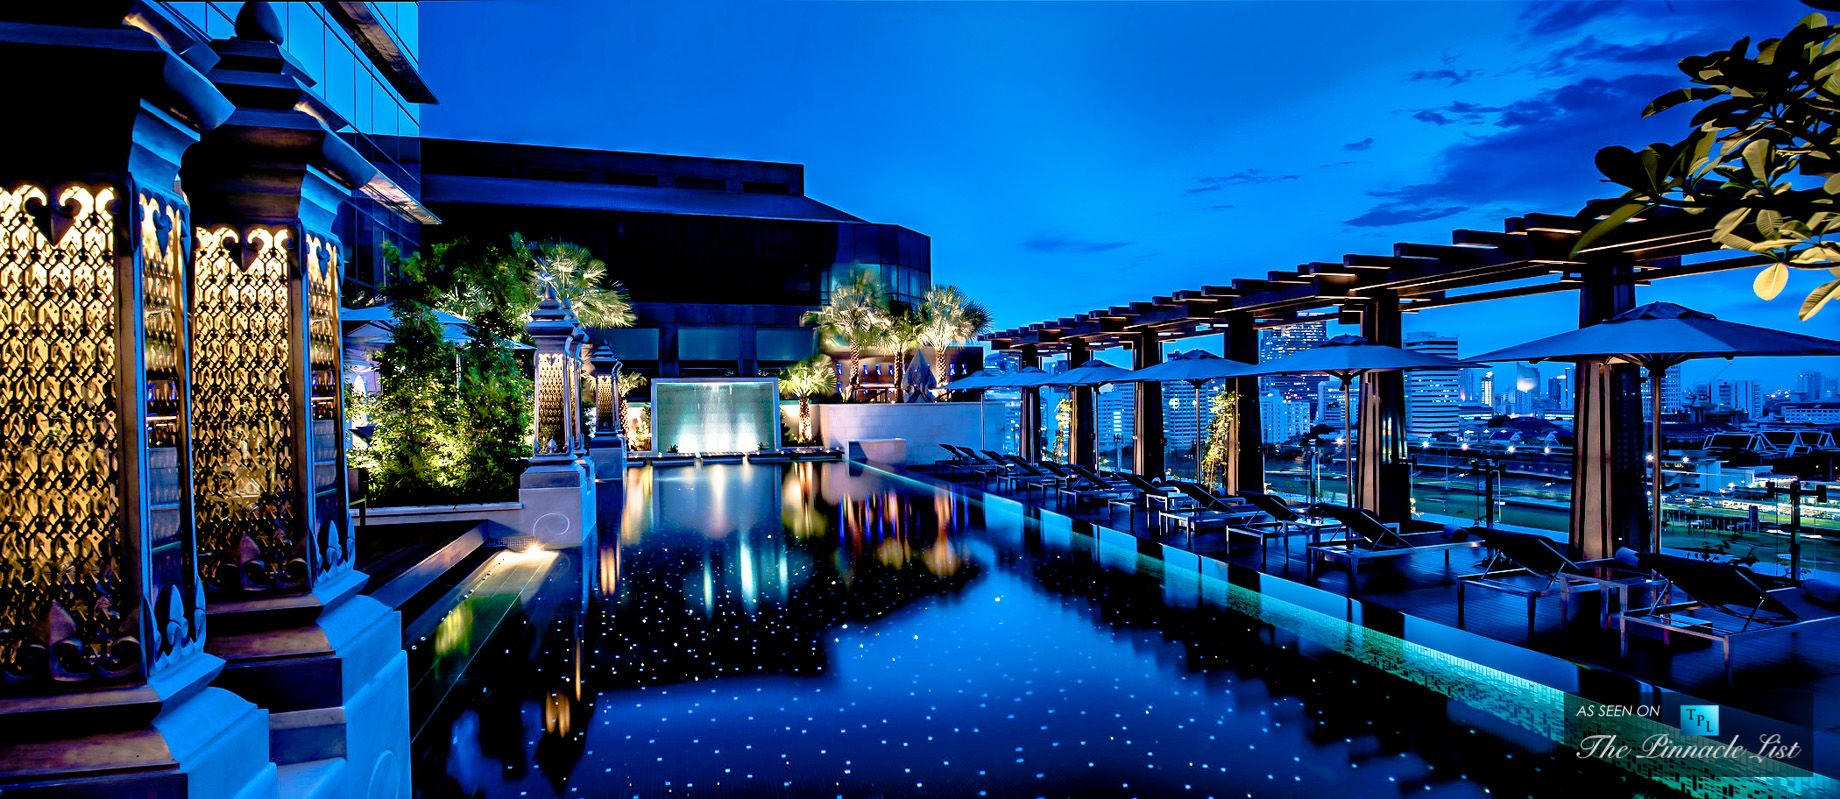 St Regis Luxury Hotel Bangkok Thailand Swimming Pool Night